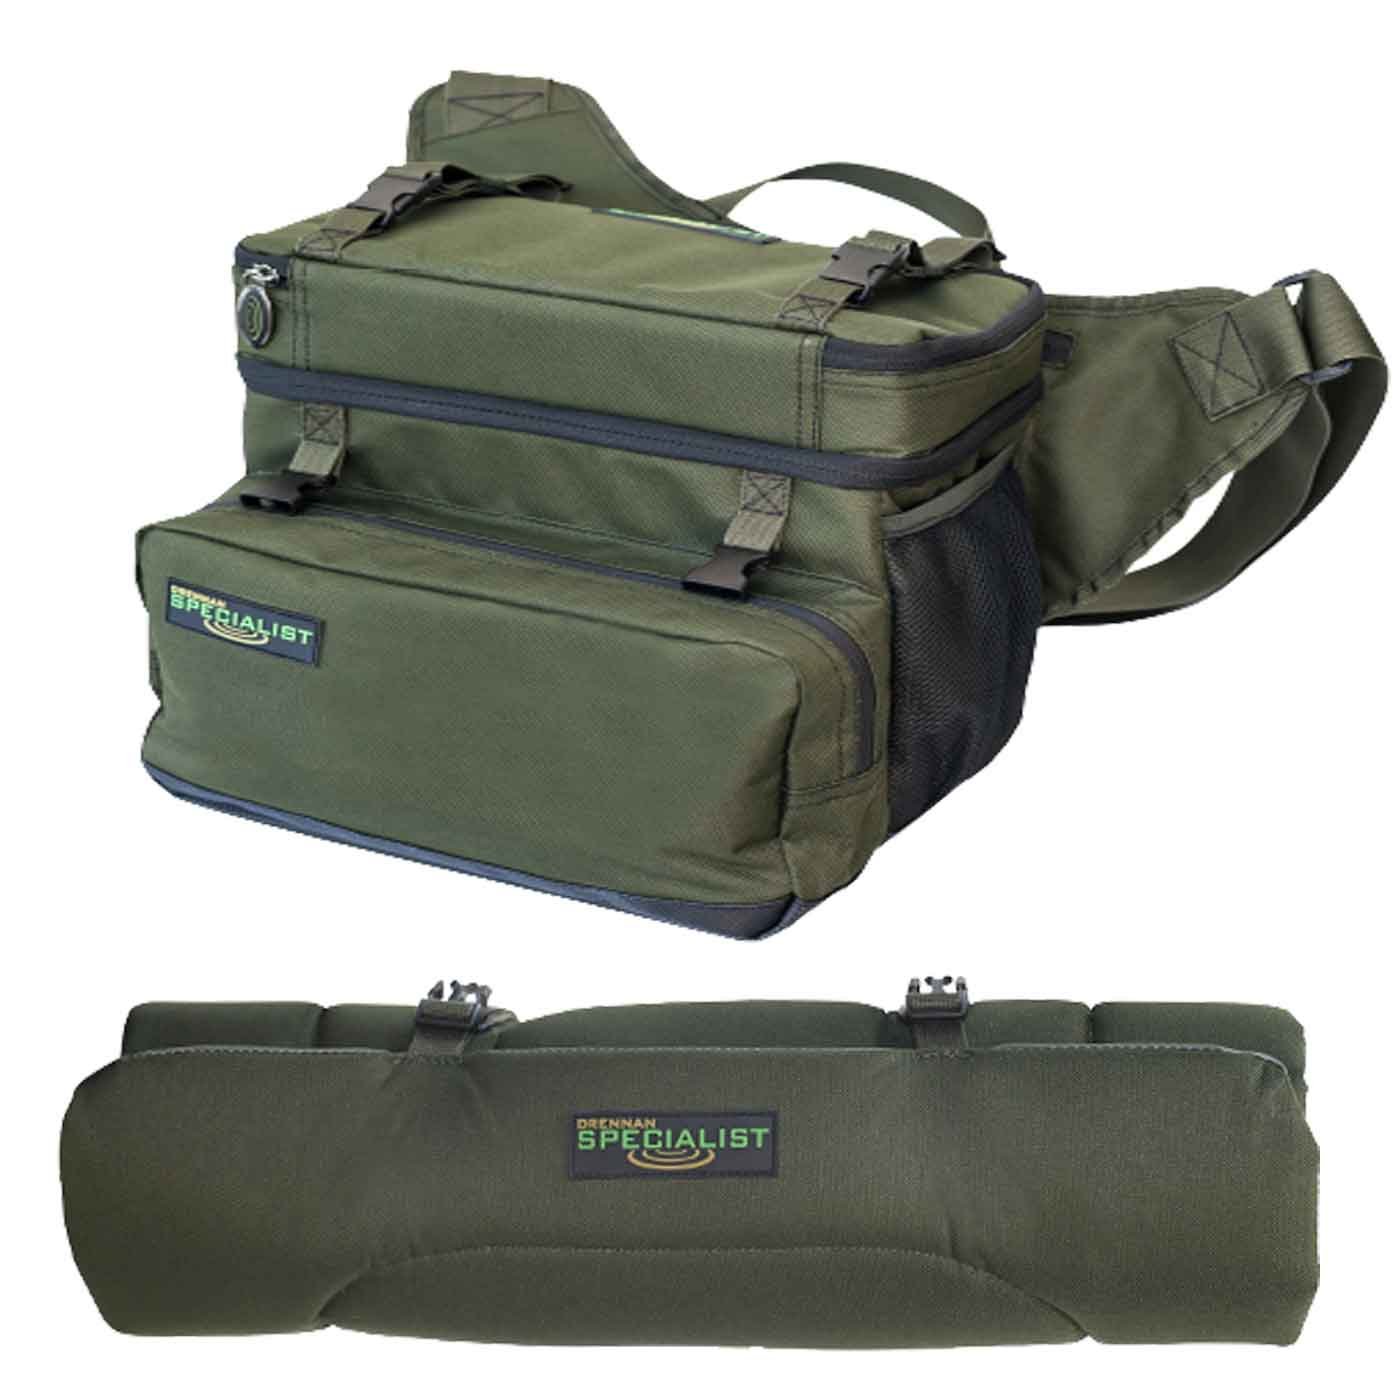 Drennan Specialist Compact Roving Bag 20Ltr + Compact Unhooking Mat